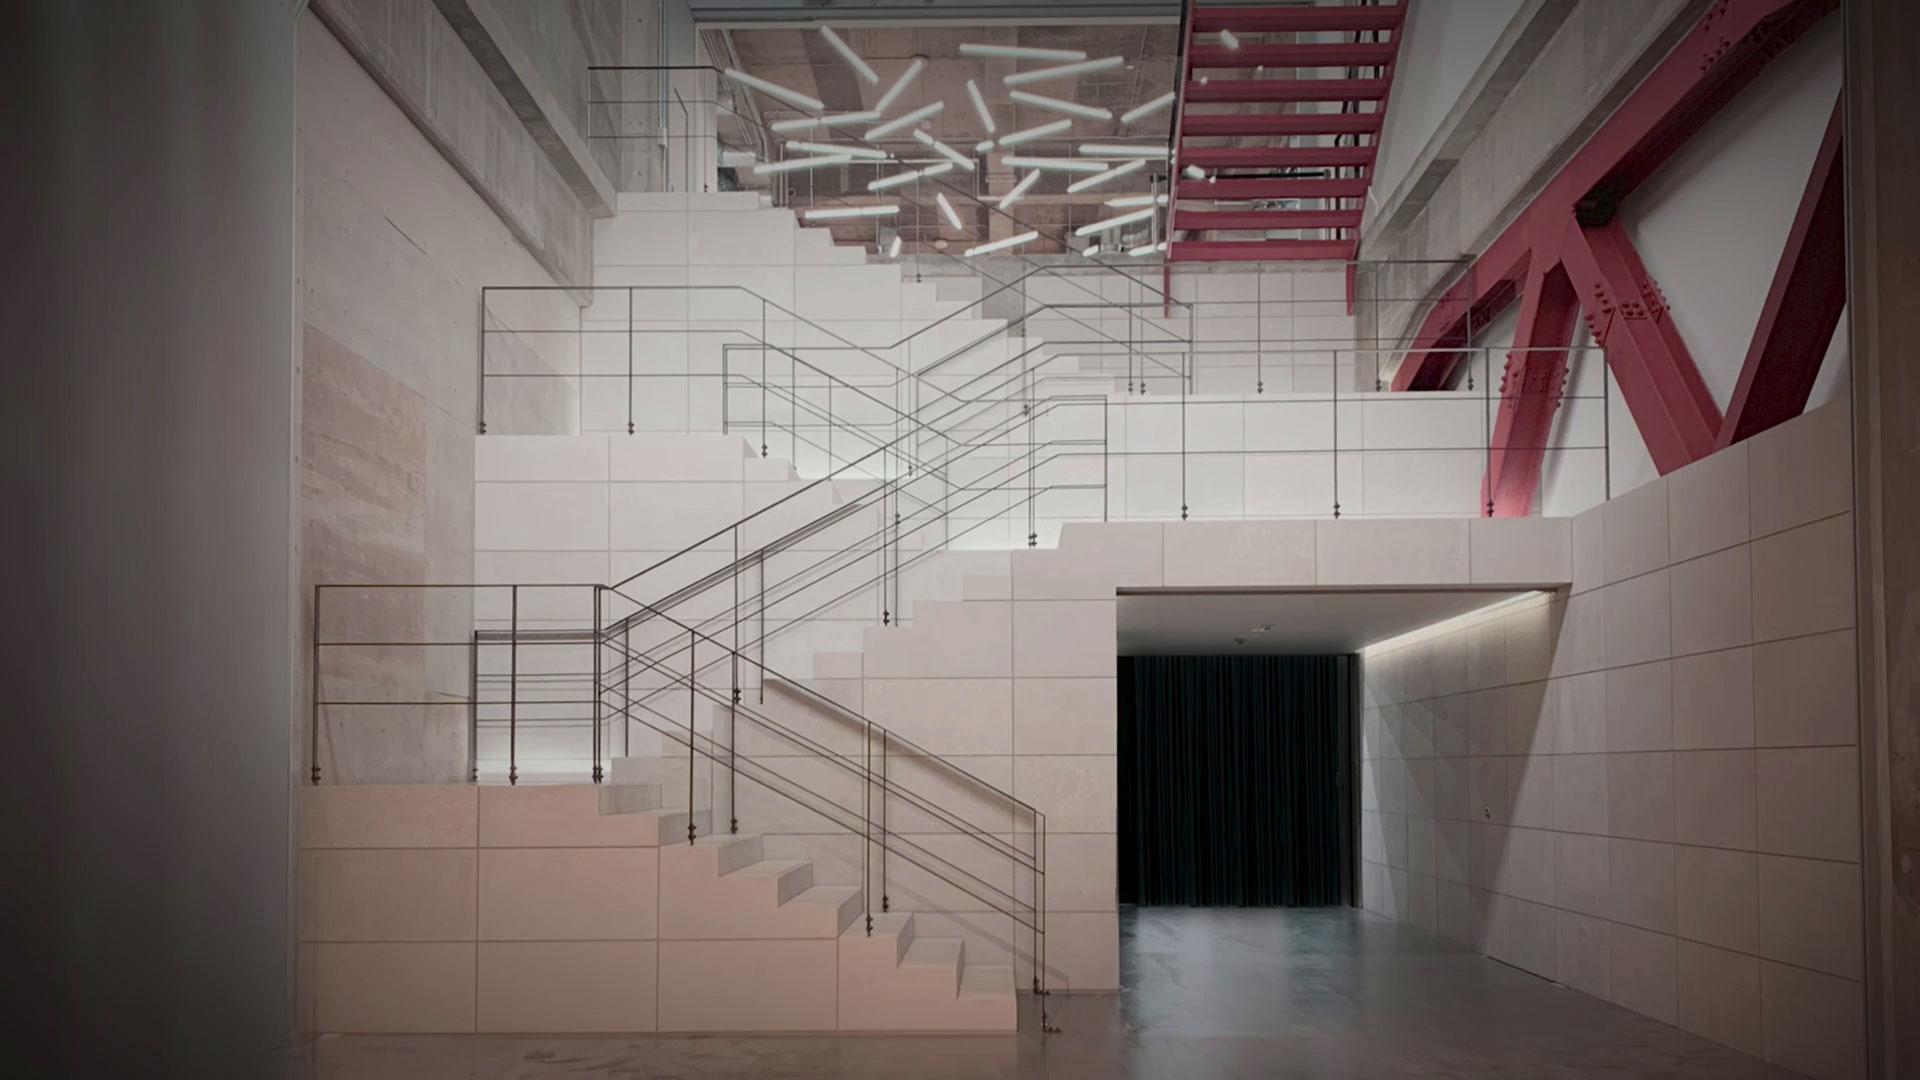 amazon prime 3d projection mapping eventagrate fashion technology touch designer dubai japan projection area